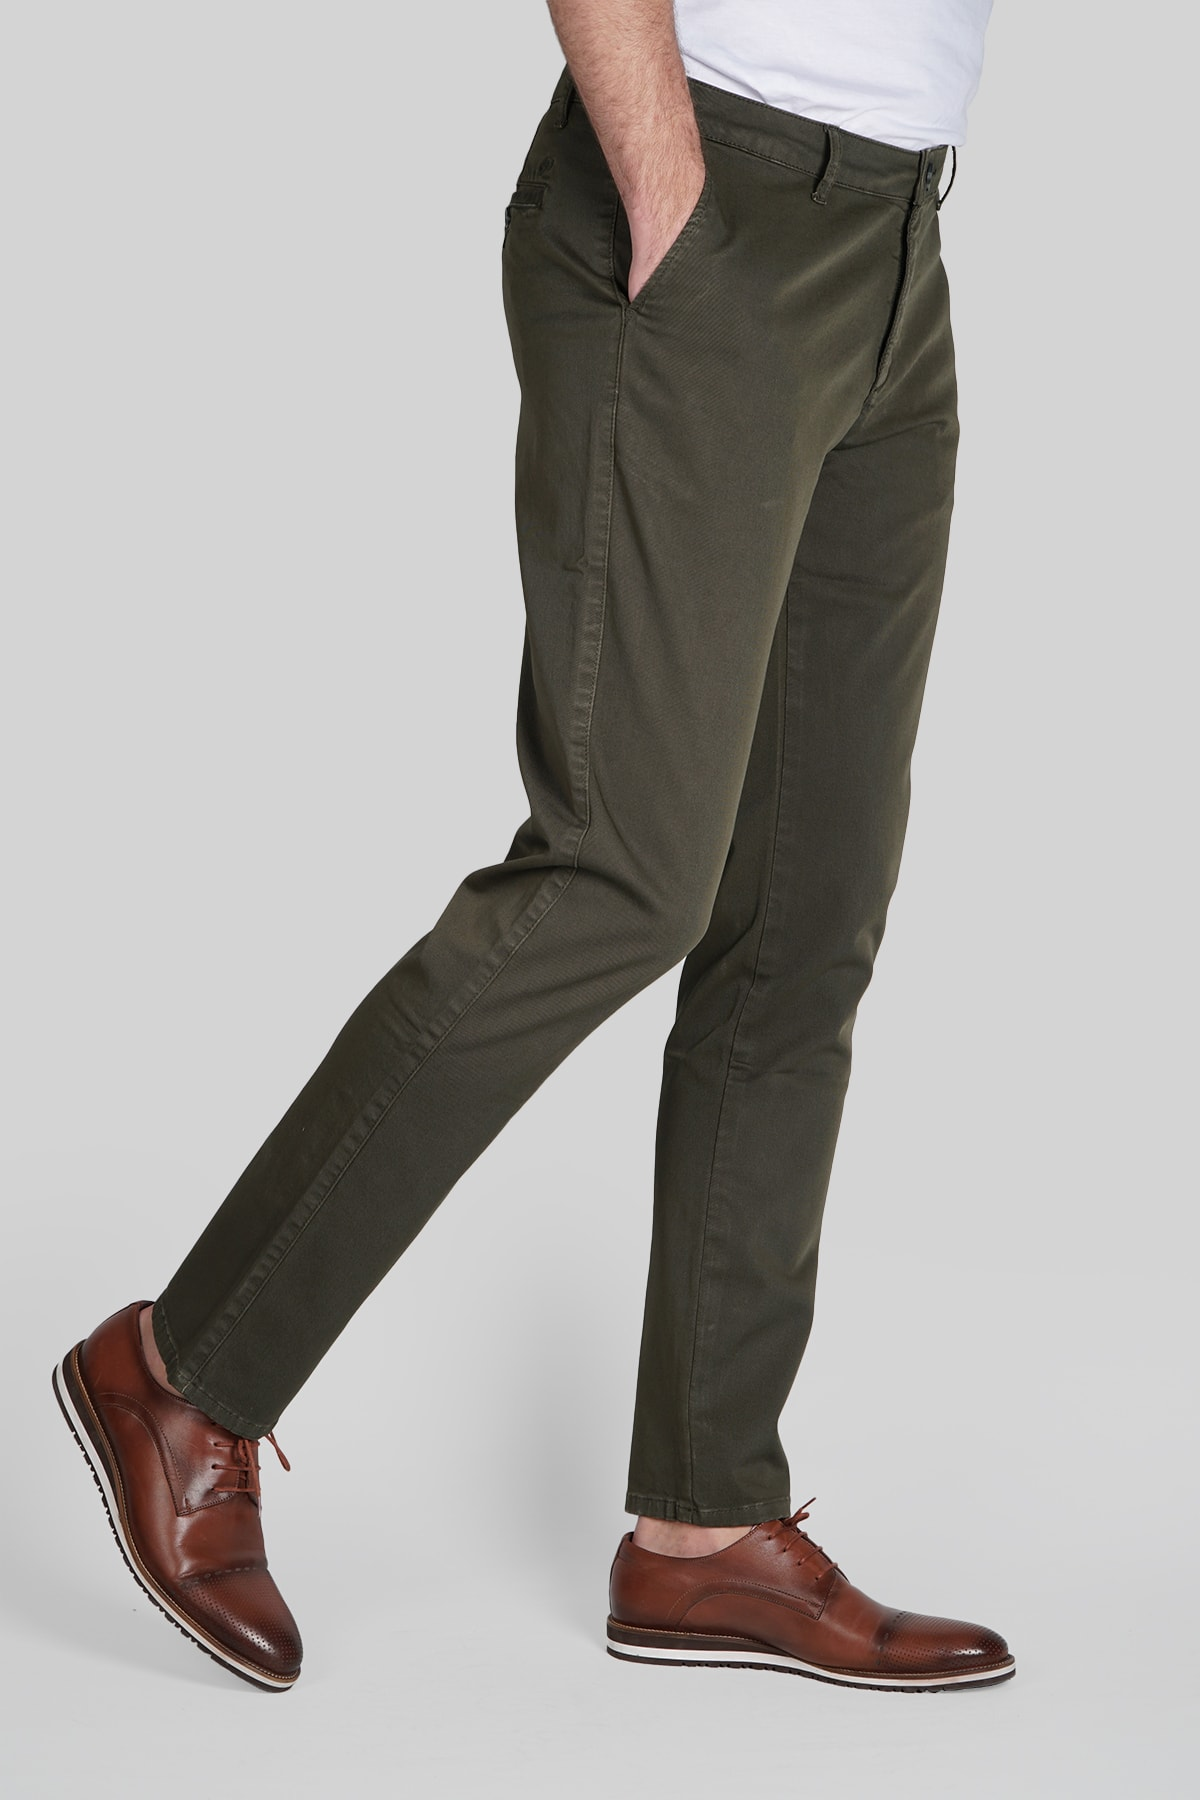 İgs Erkek Haki Dynamic Pantolon 2